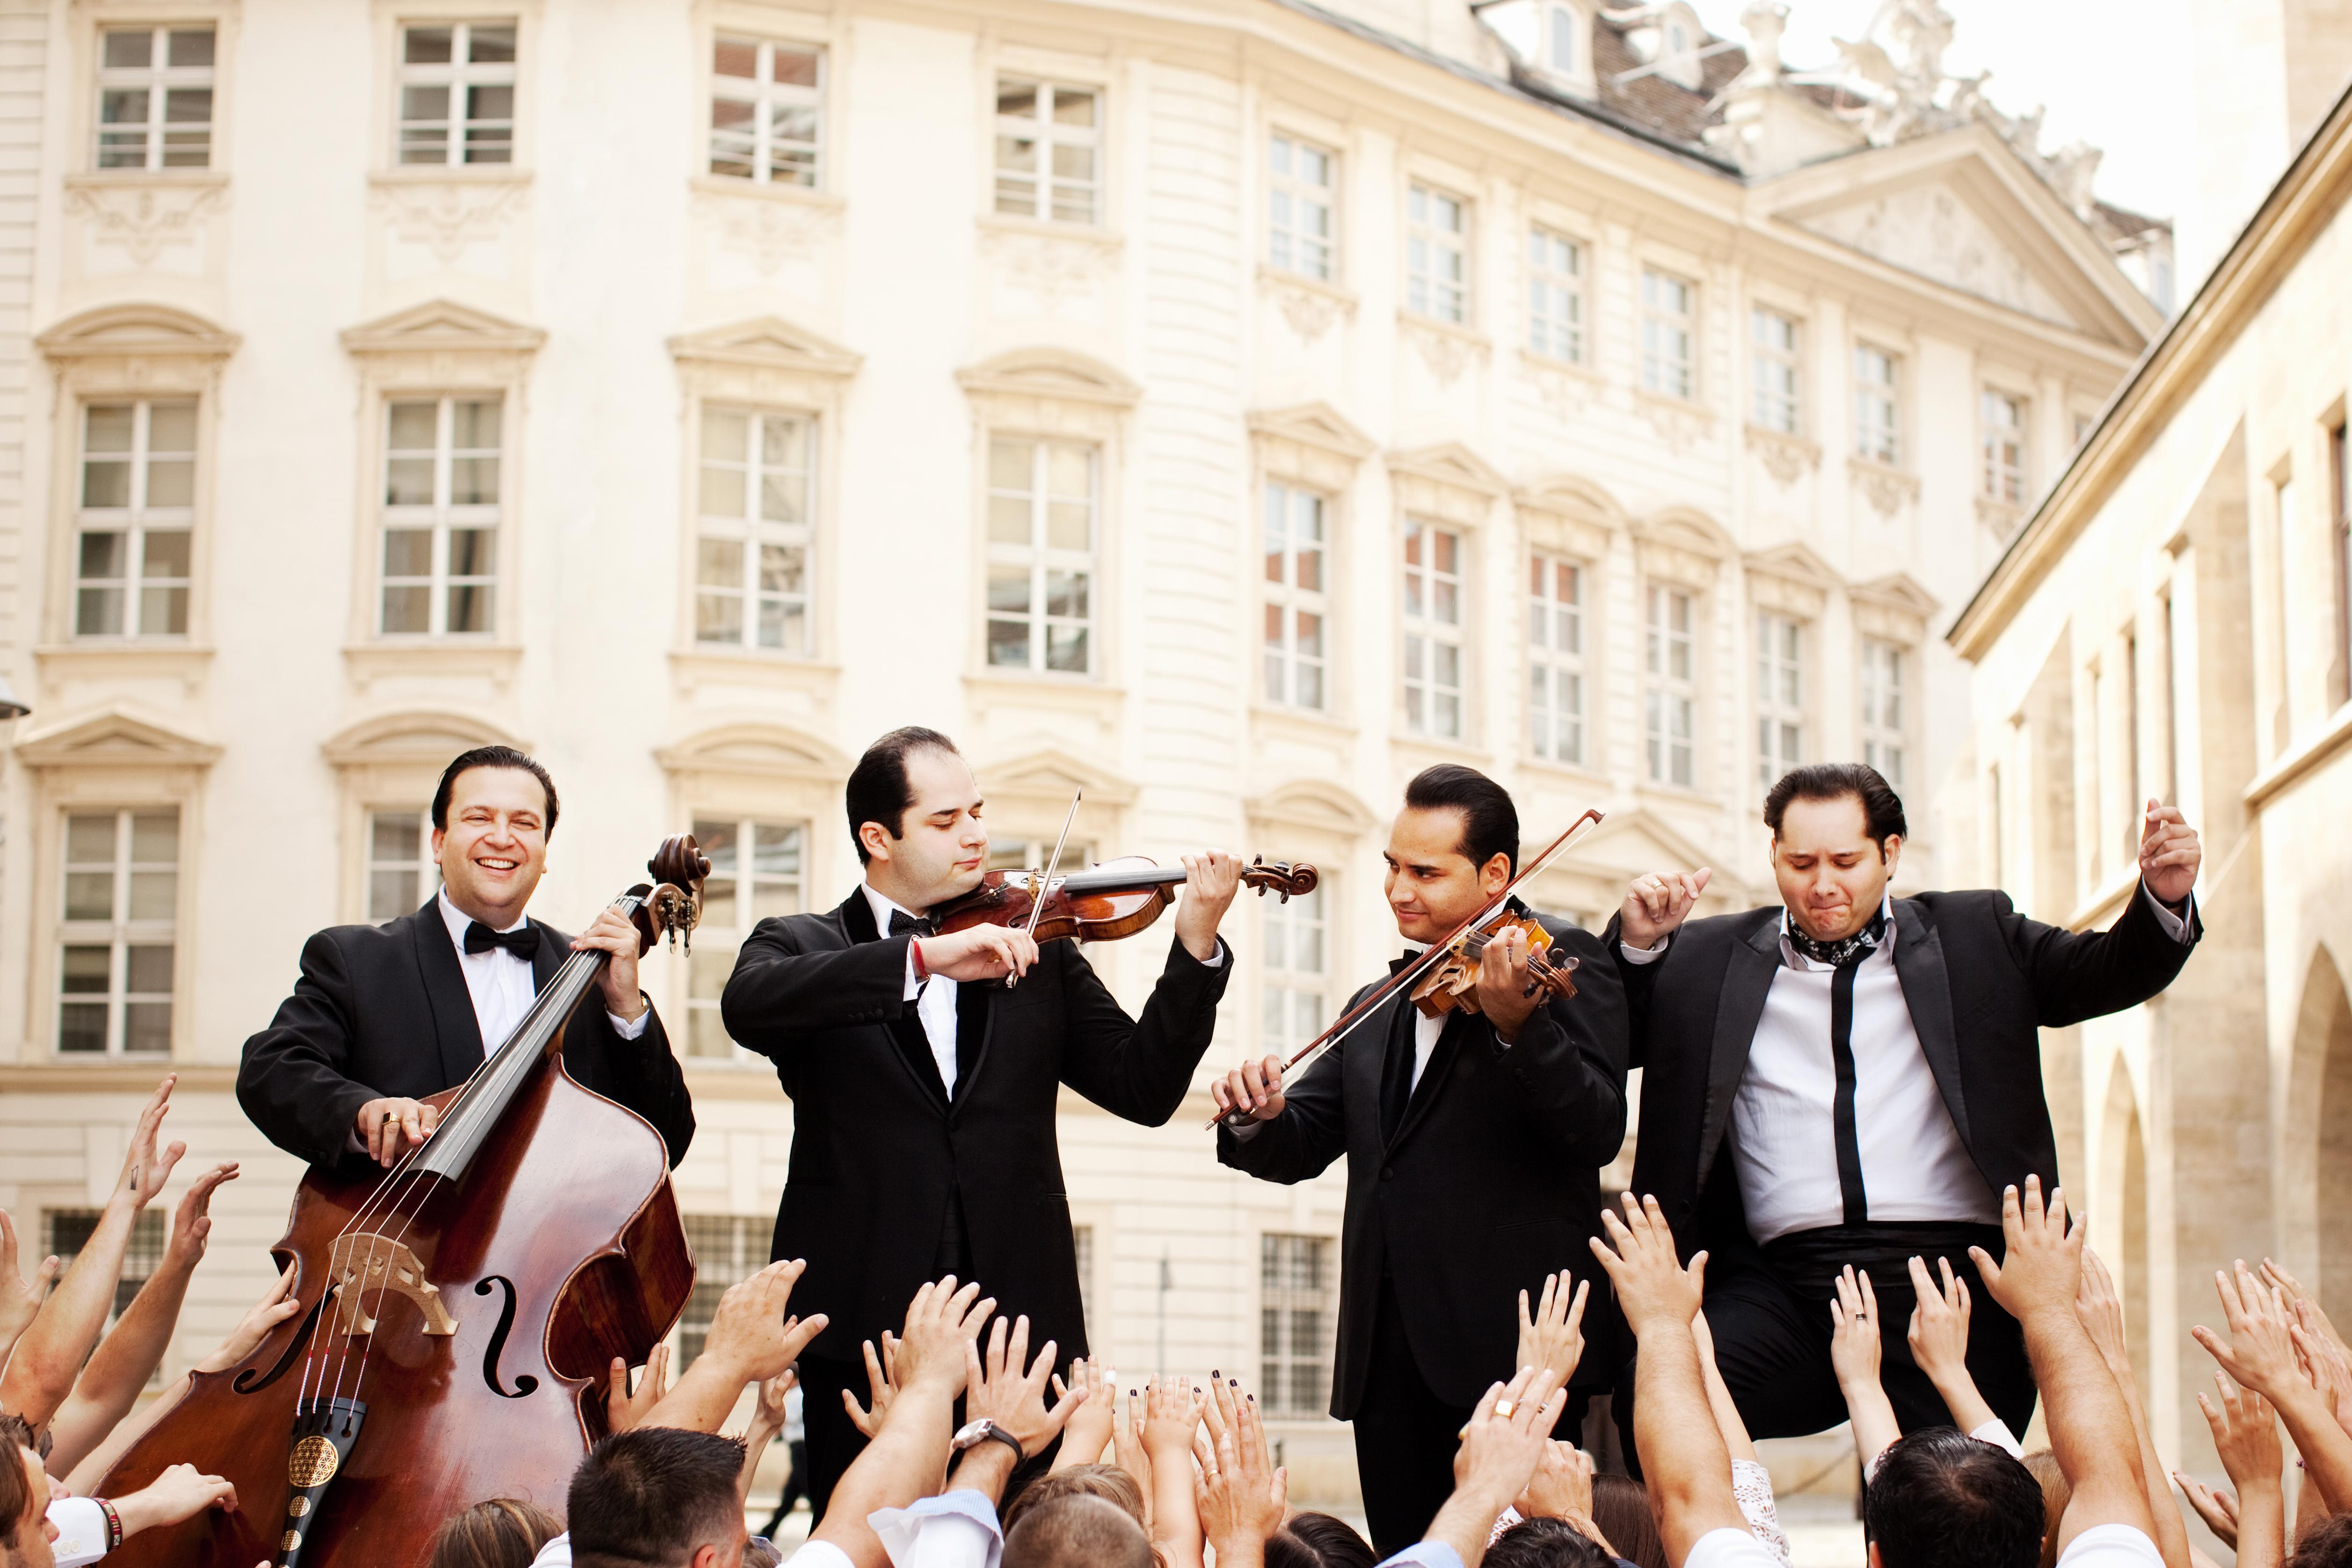 Klosters Music - Bohemian Rhapsodies